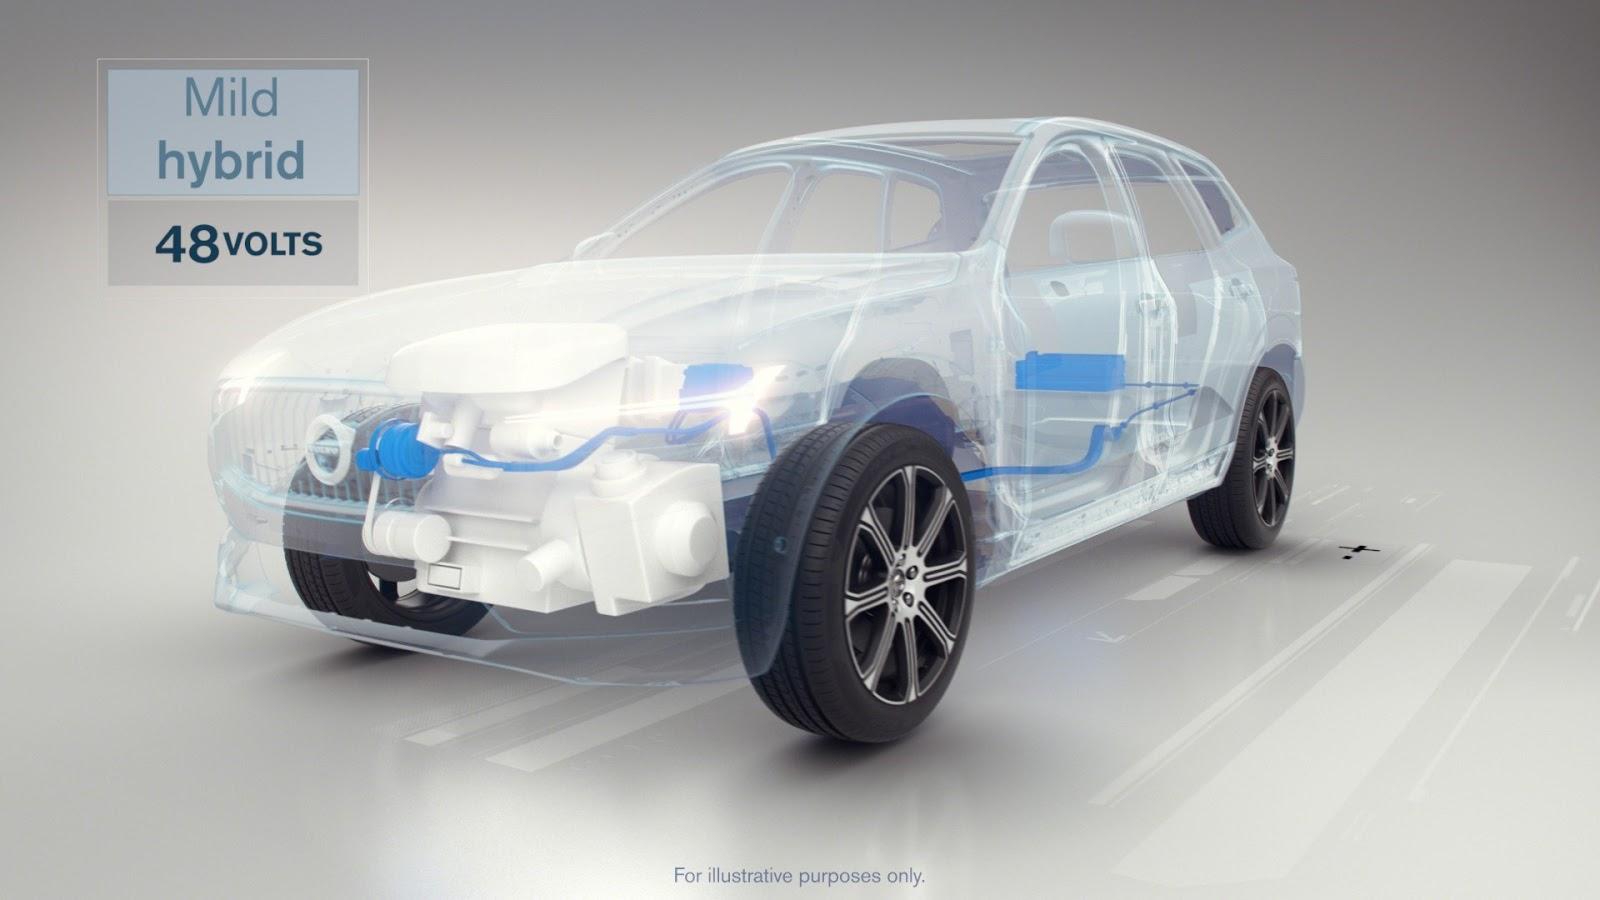 VOLVO MILD2BHYBRID 482BVOLTS Από το 2019, όλα τα Volvo θα έχουν ηλεκτροκινητήρα Hybrid, Volvo, zblog, καινούργιο, καινούρια, υβριδικό